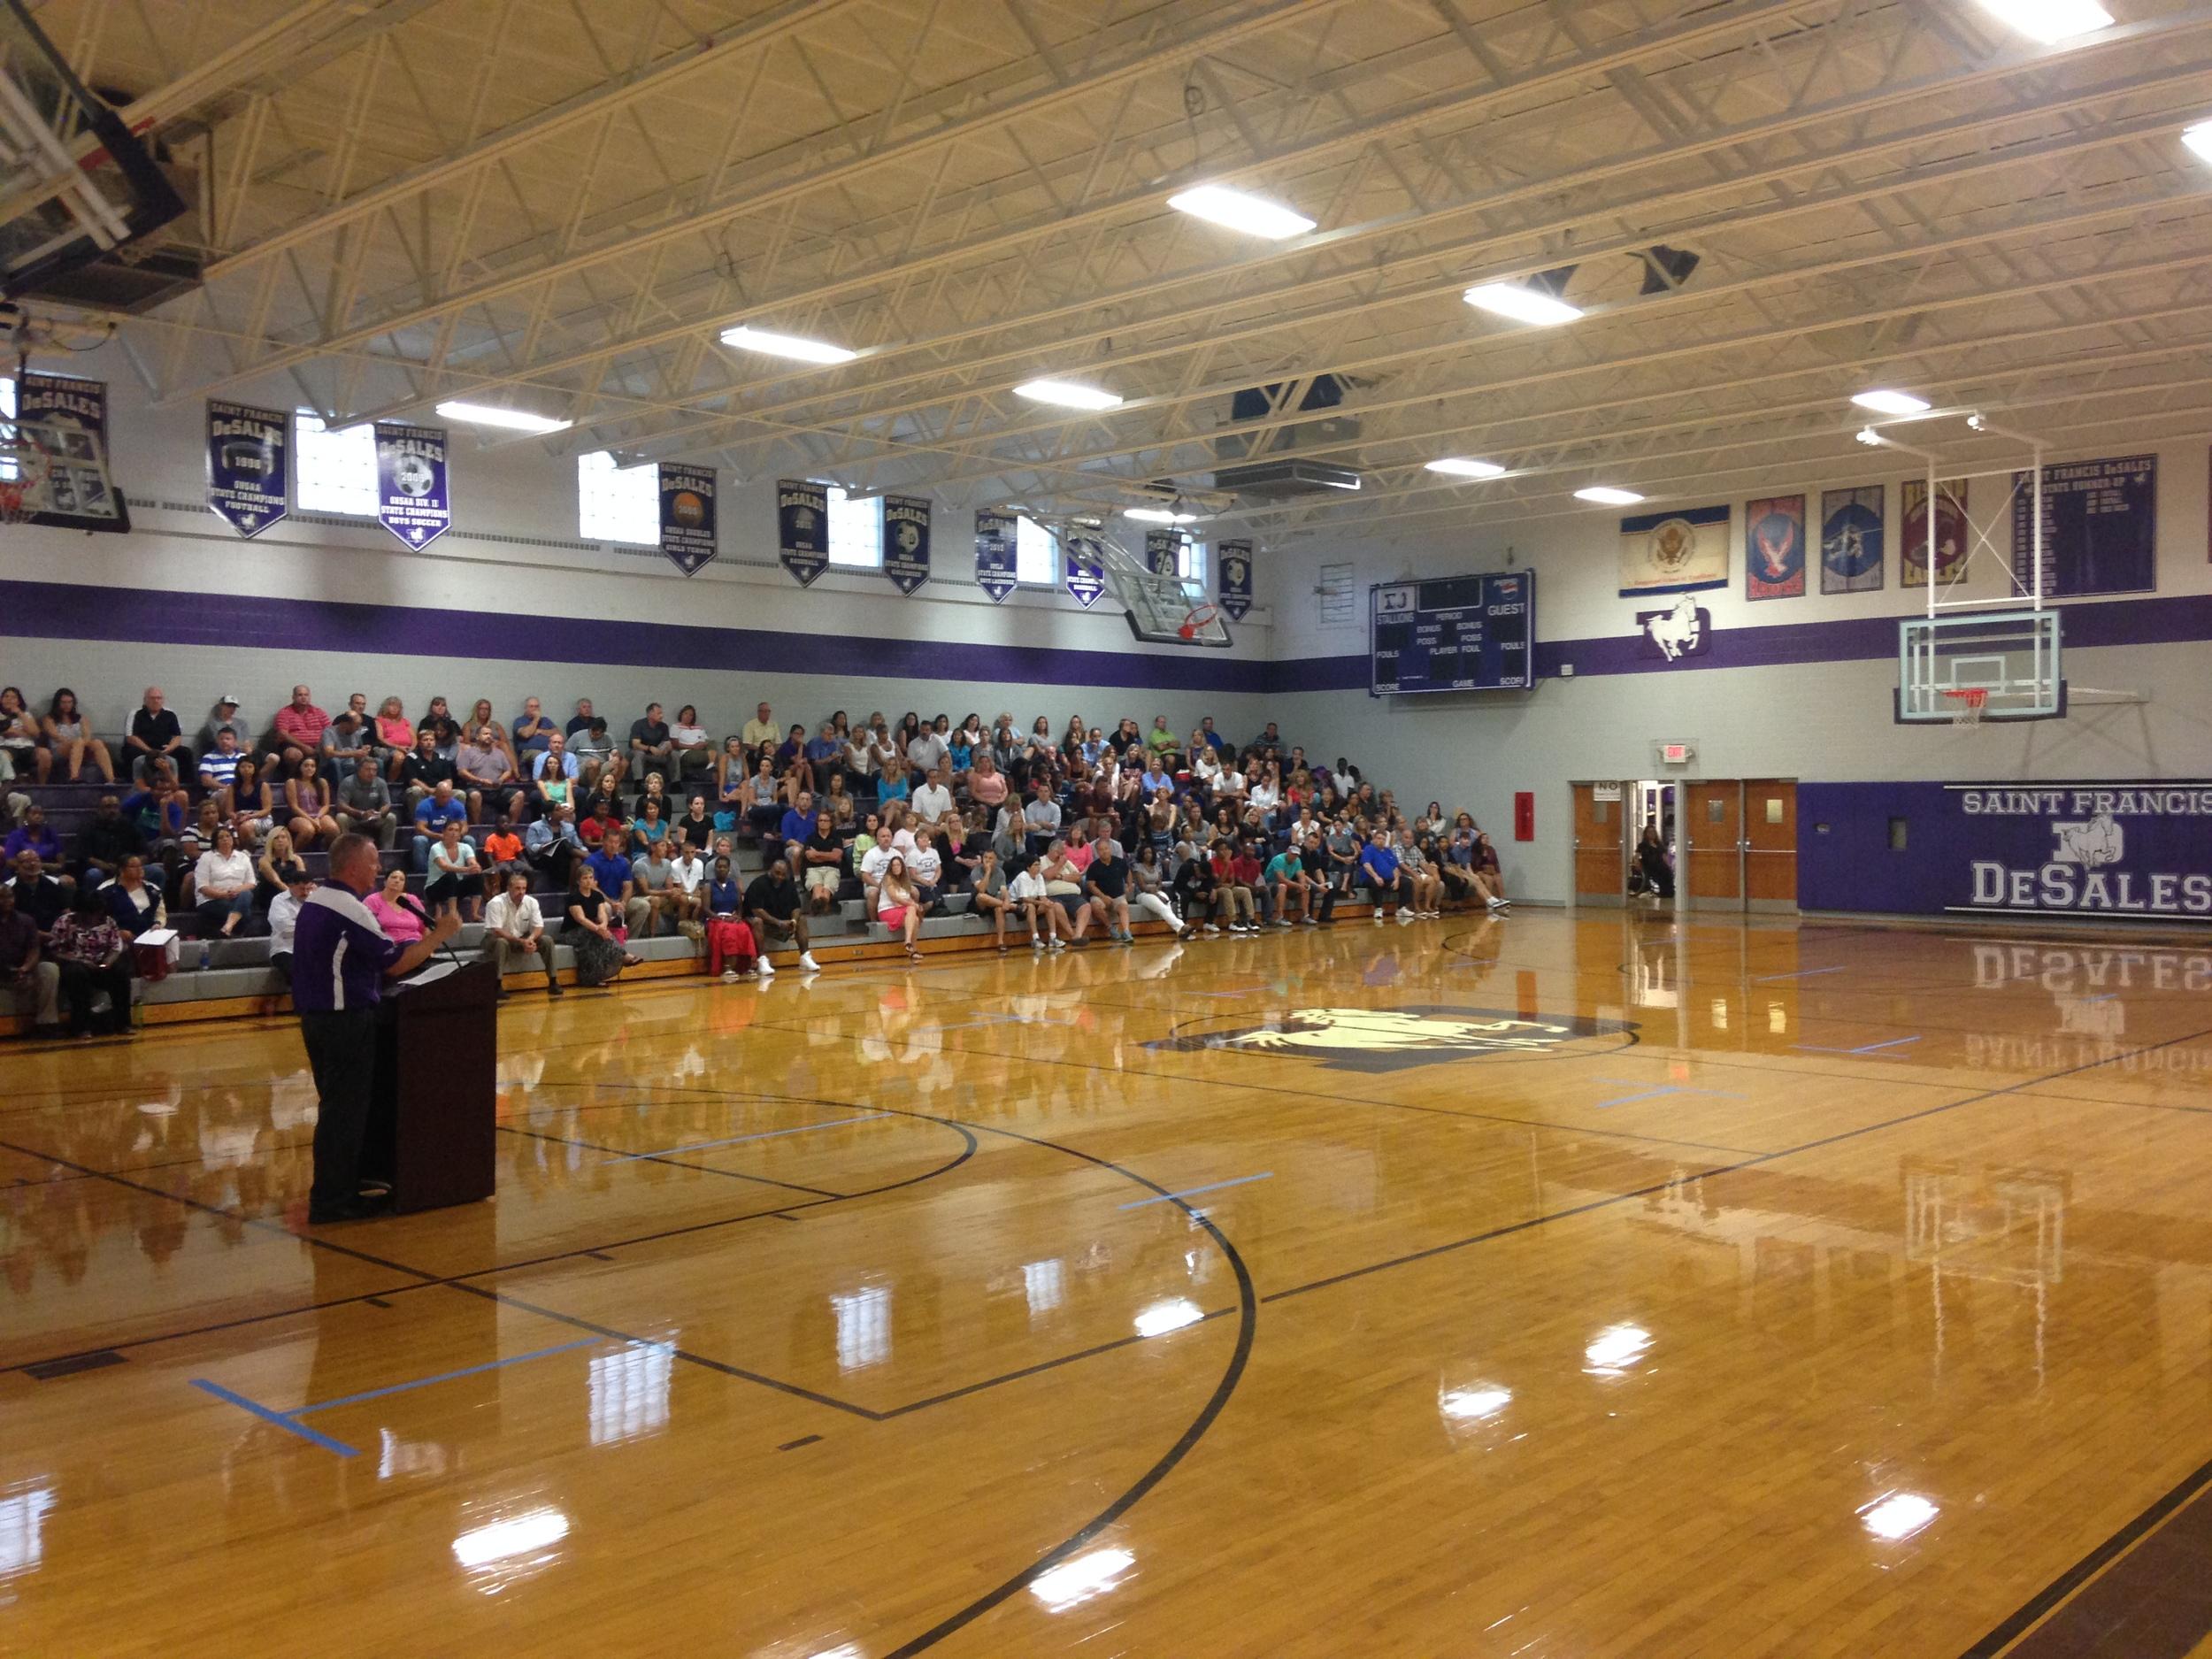 Principal Dan Garrick addresses the crowd at the 2016 Parent of Athlete Meeting